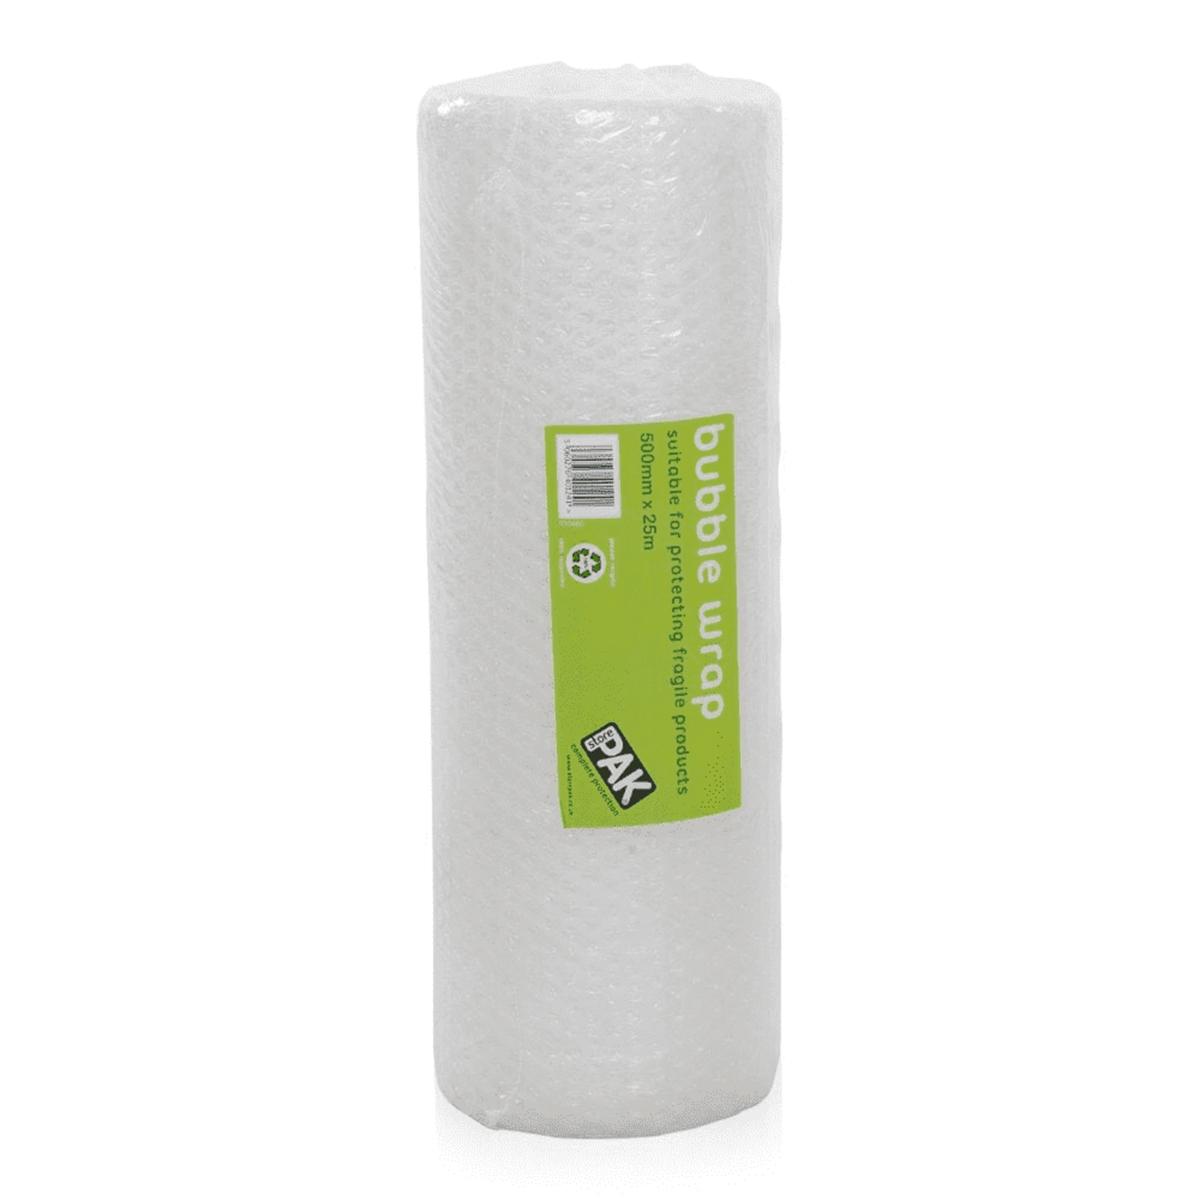 StorePAK Bubble Wrap Roll - 500mm x 25m